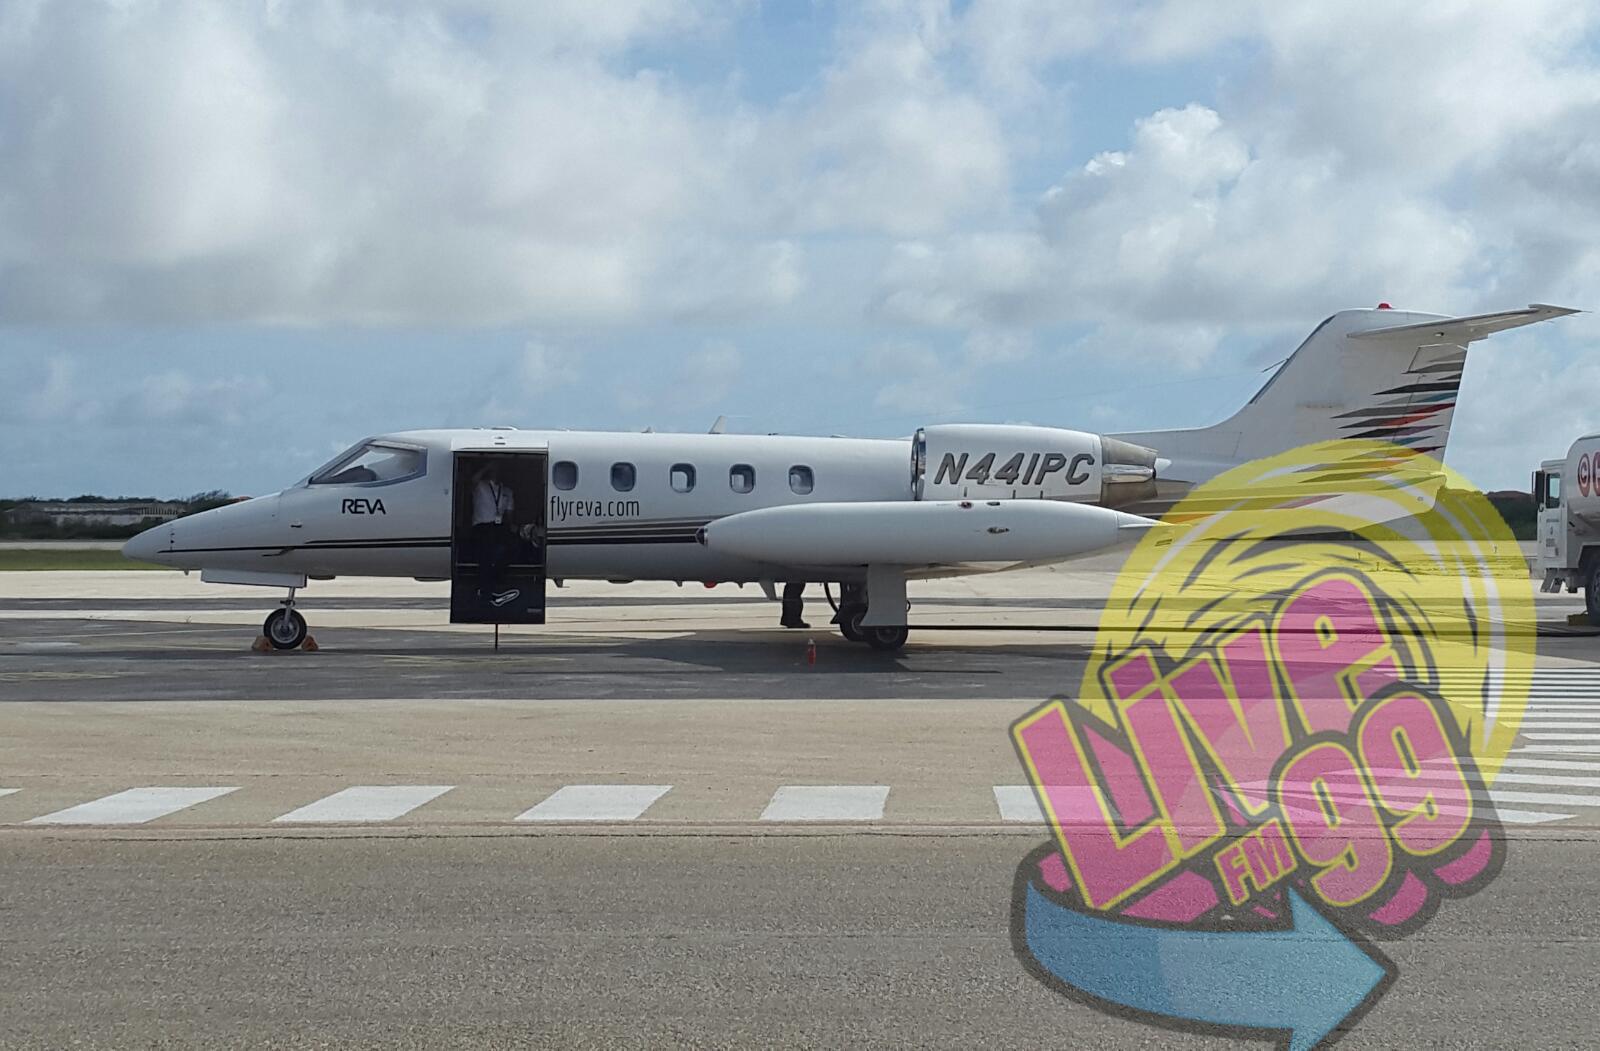 MERKA A MANDA 2 AMBULANCE FLIGHT BIN BUSKA E 2 VIKTIMA NAN DI E AKSIDENTE DI AYERA NOCHI.